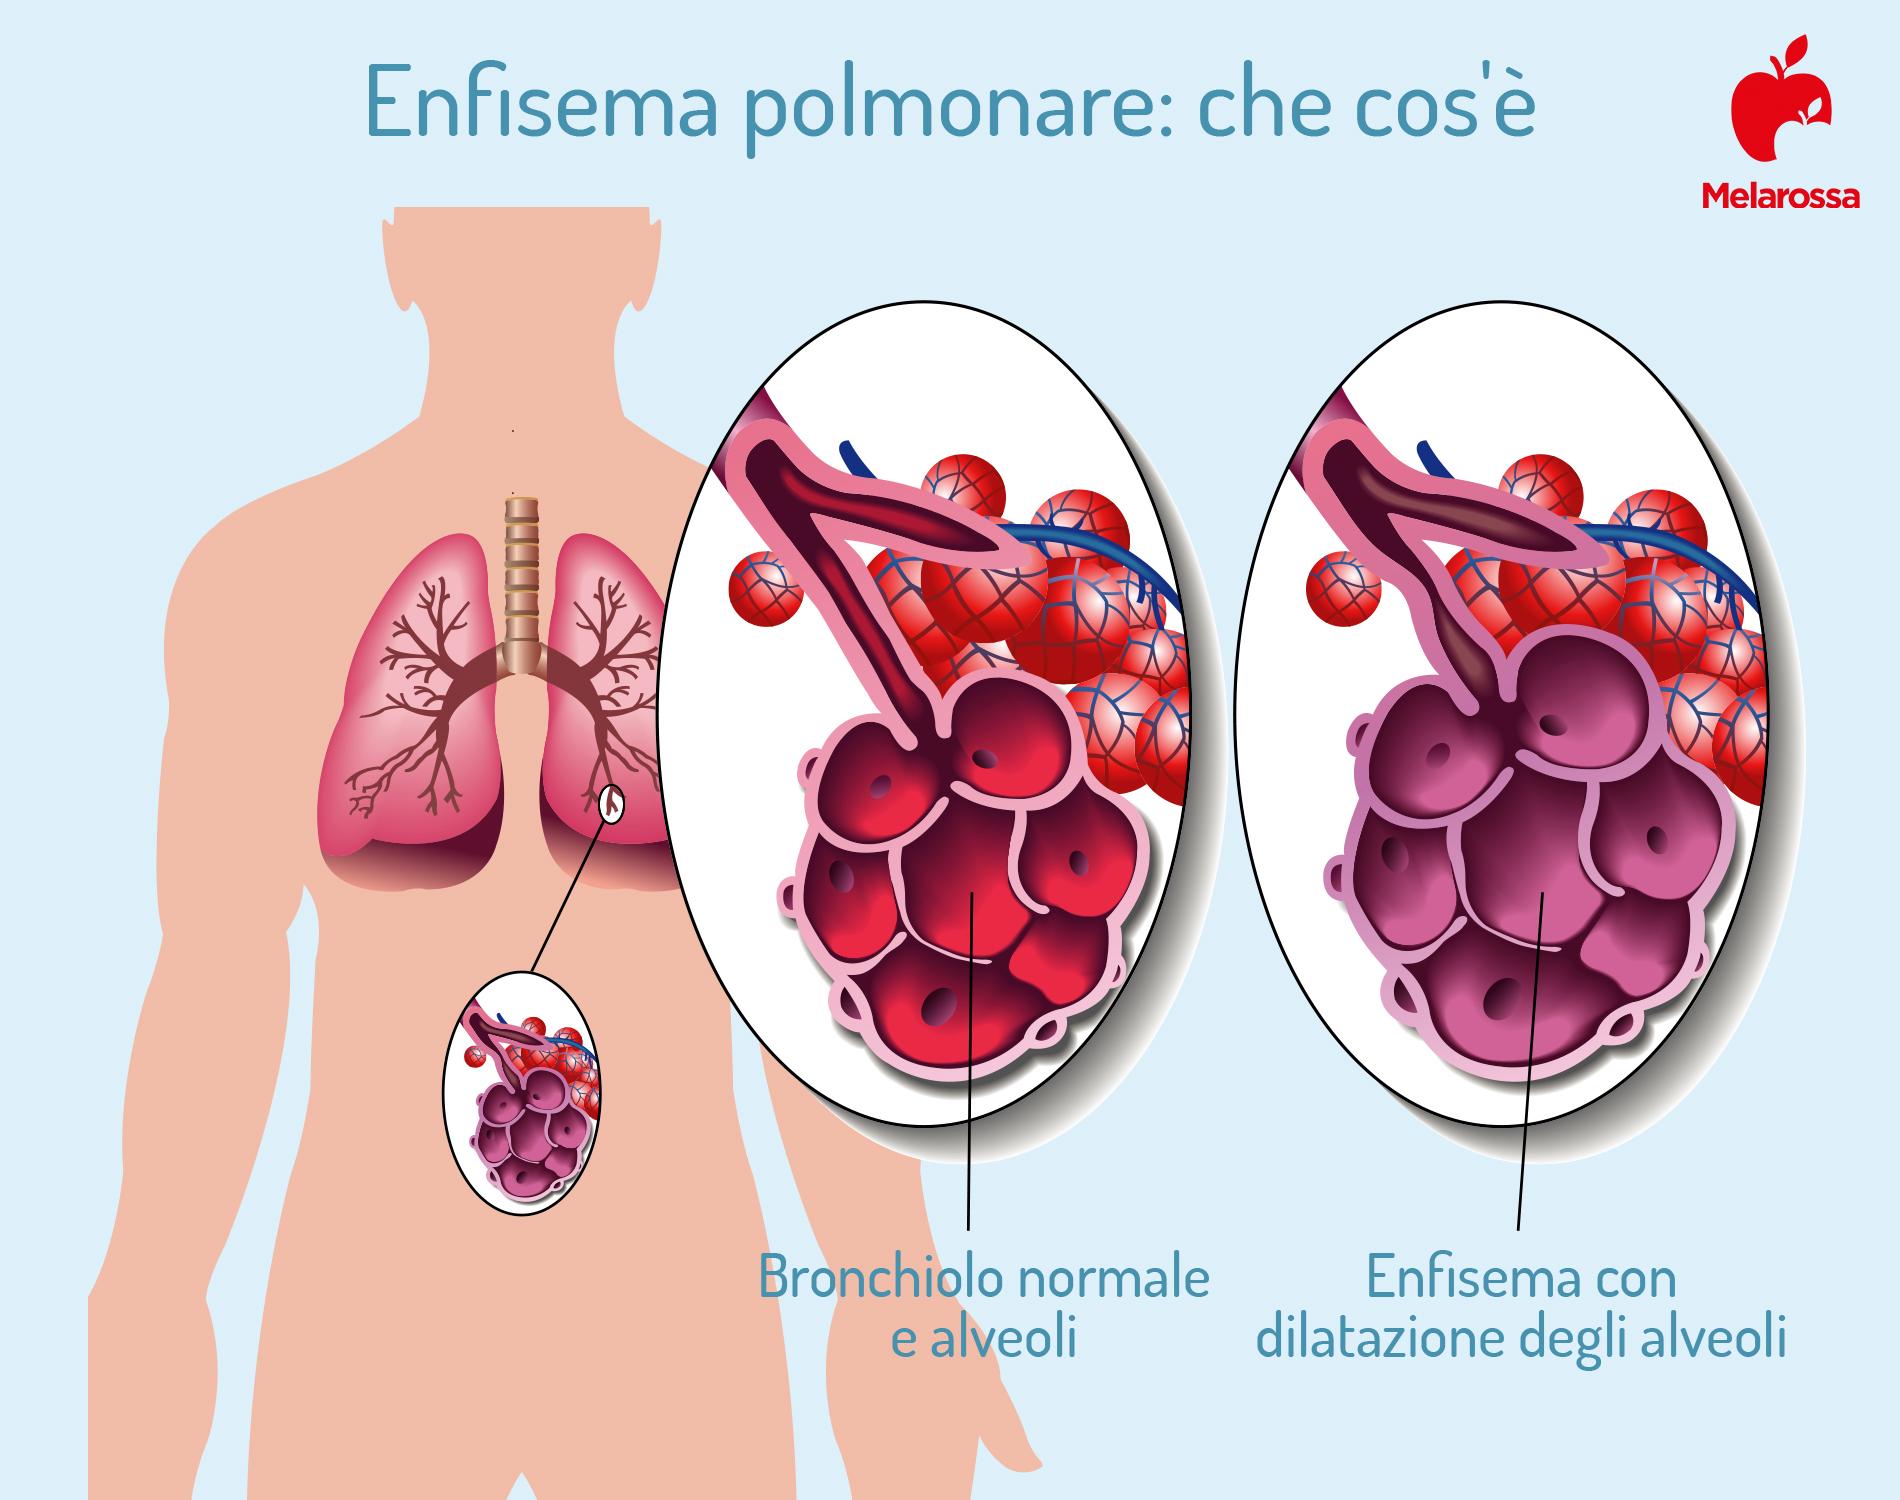 malattie respiratorie: enfisema polmonare